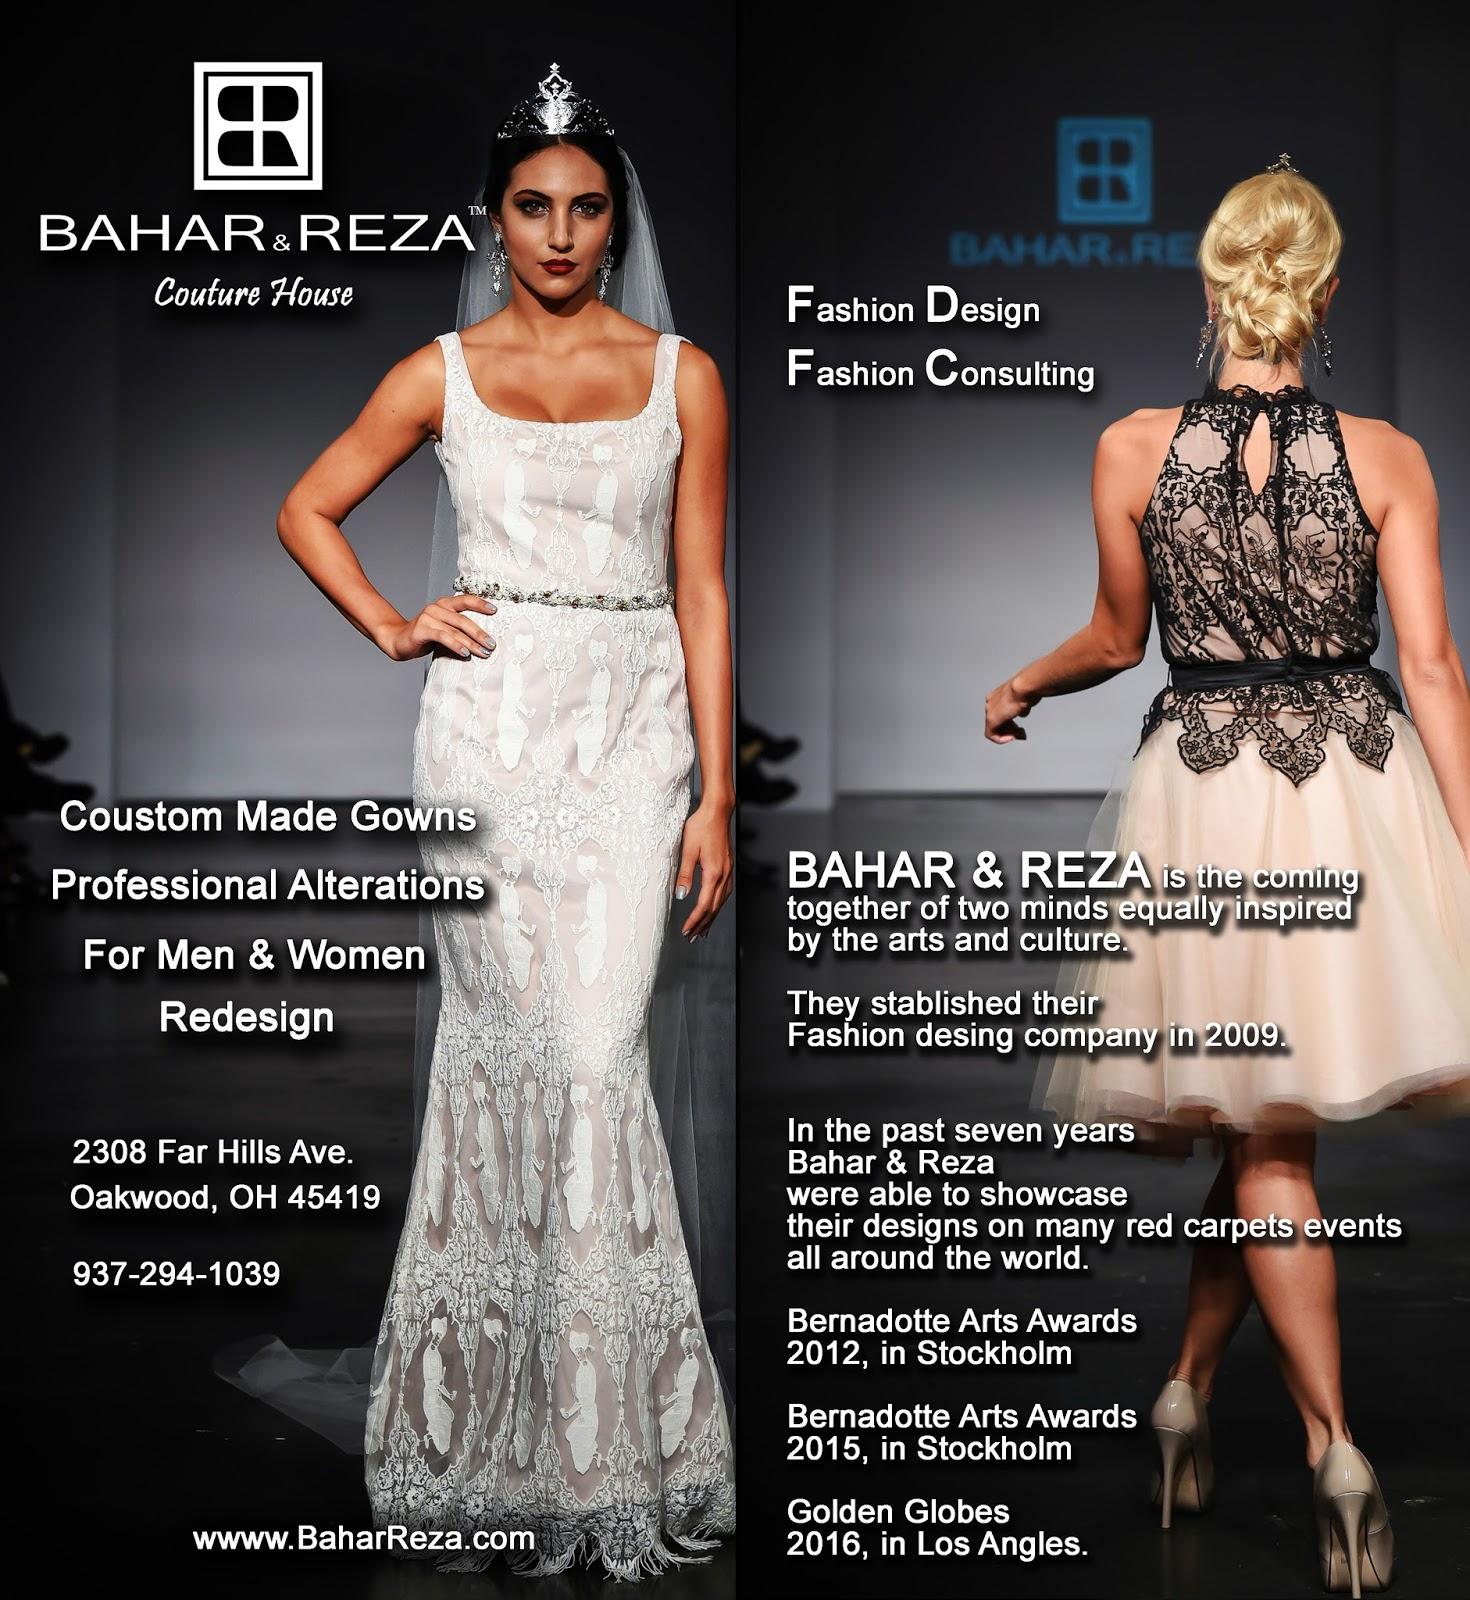 BaharReza Will Be At Bridal Open House On Saturday March 5th 900 To 200 PM AddressPrime Time Party Rental 5225 N Springboro Pike DaytonOhio 45439